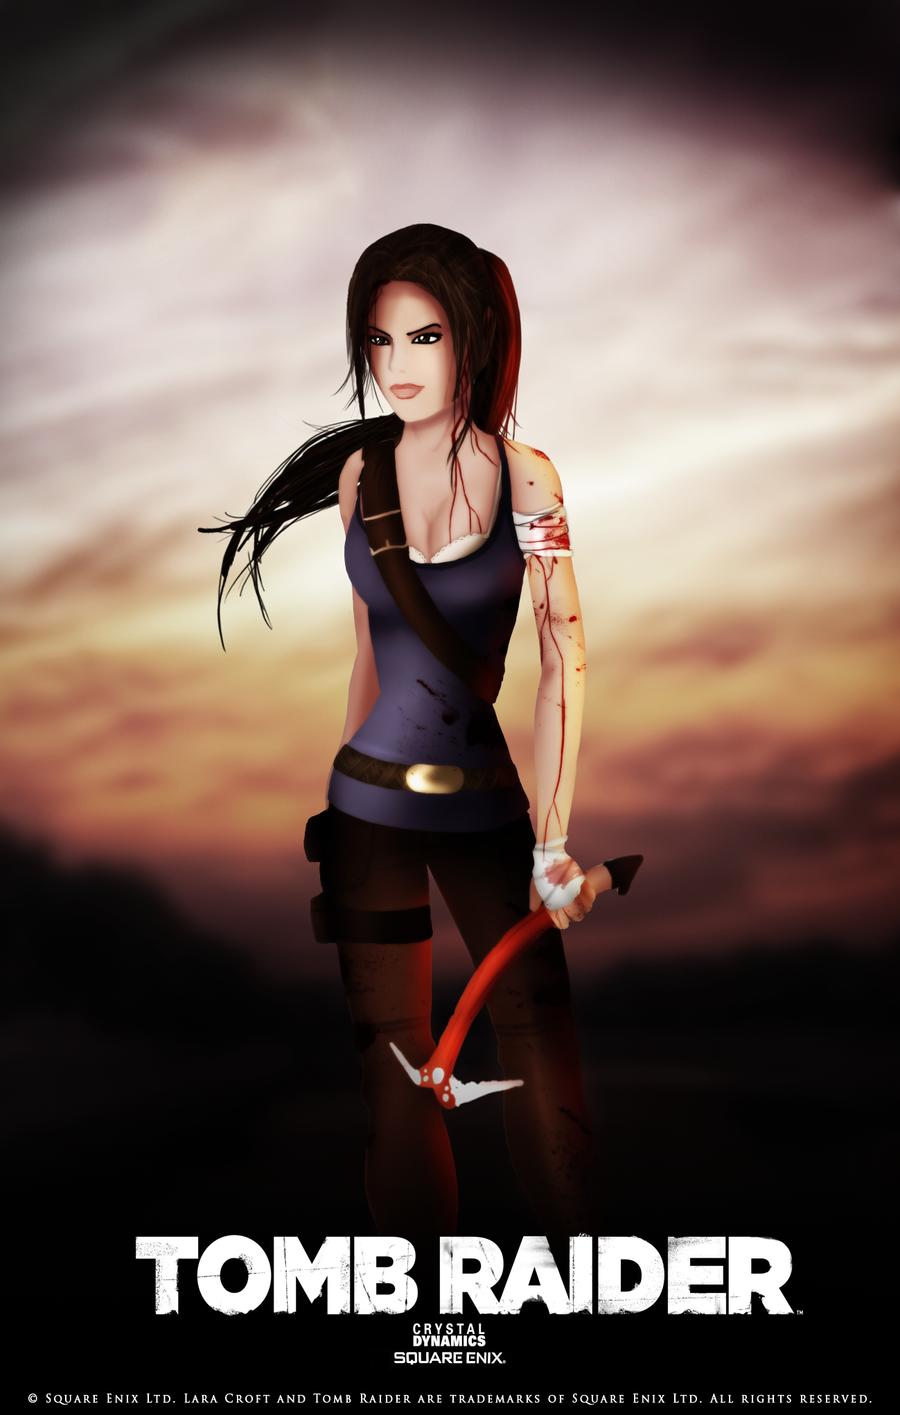 Tomb Raider - A survivor is born by FearEffectInferno